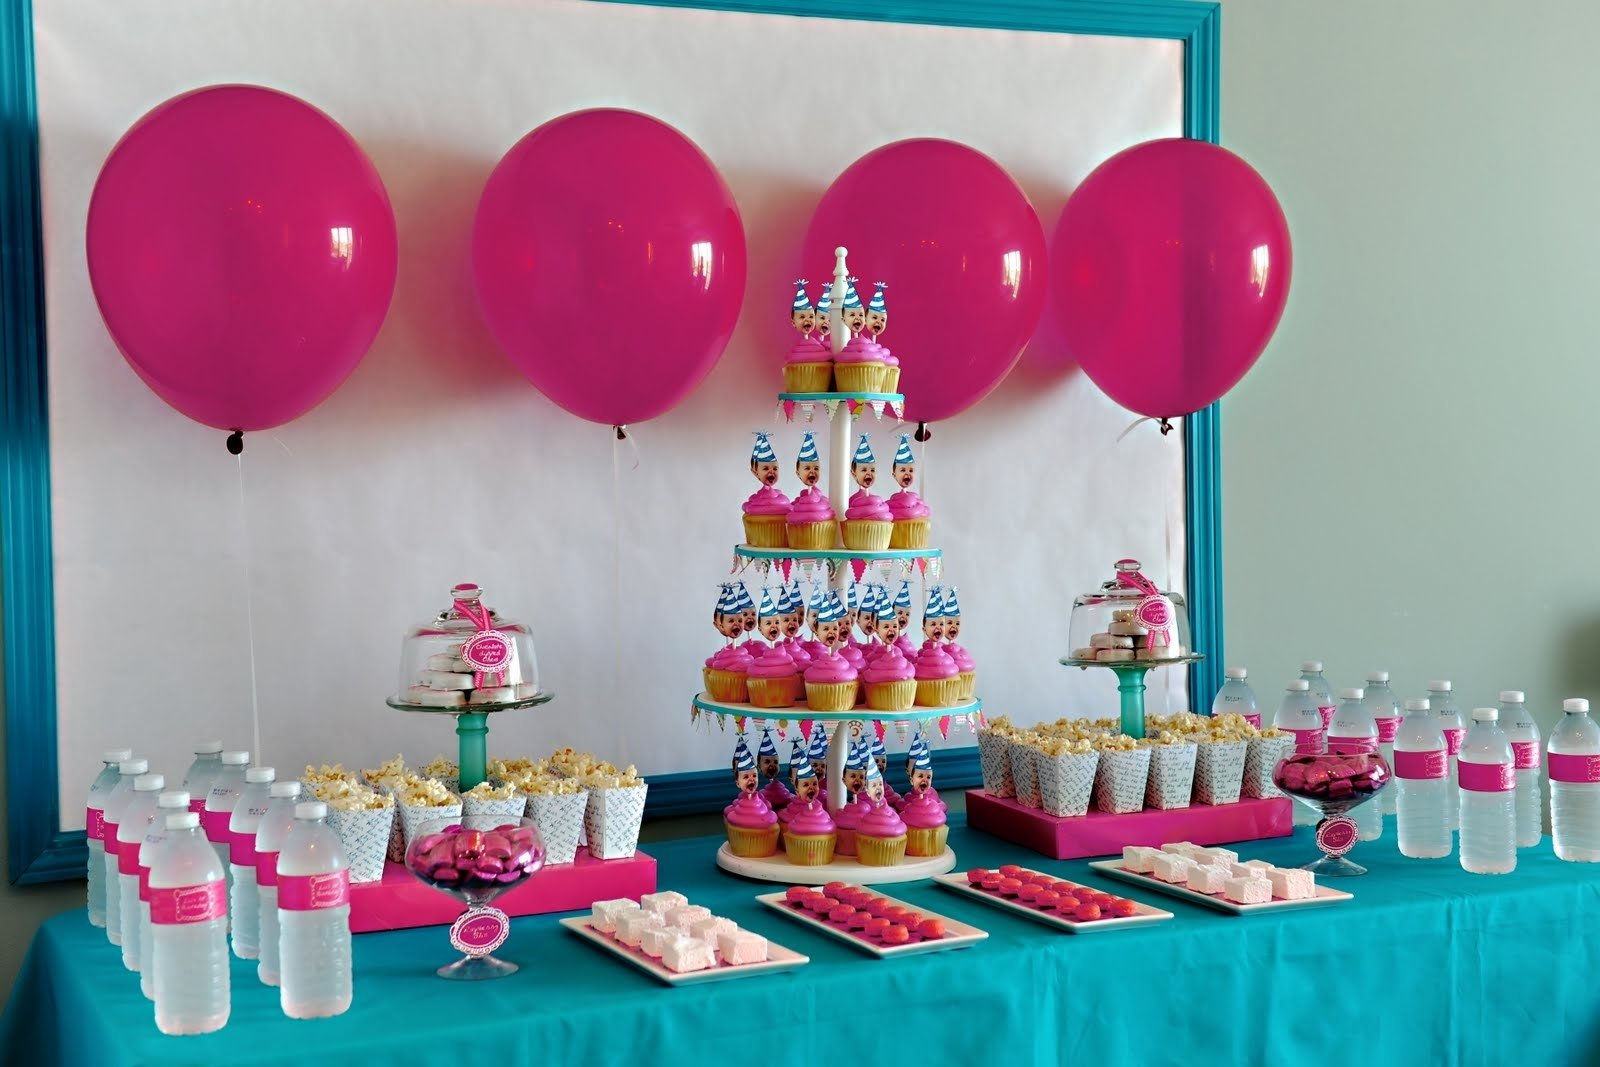 10 Fabulous Cool Teenage Birthday Party Ideas 10 year old birthday party ideas teenage birthday party ideas 5 2021